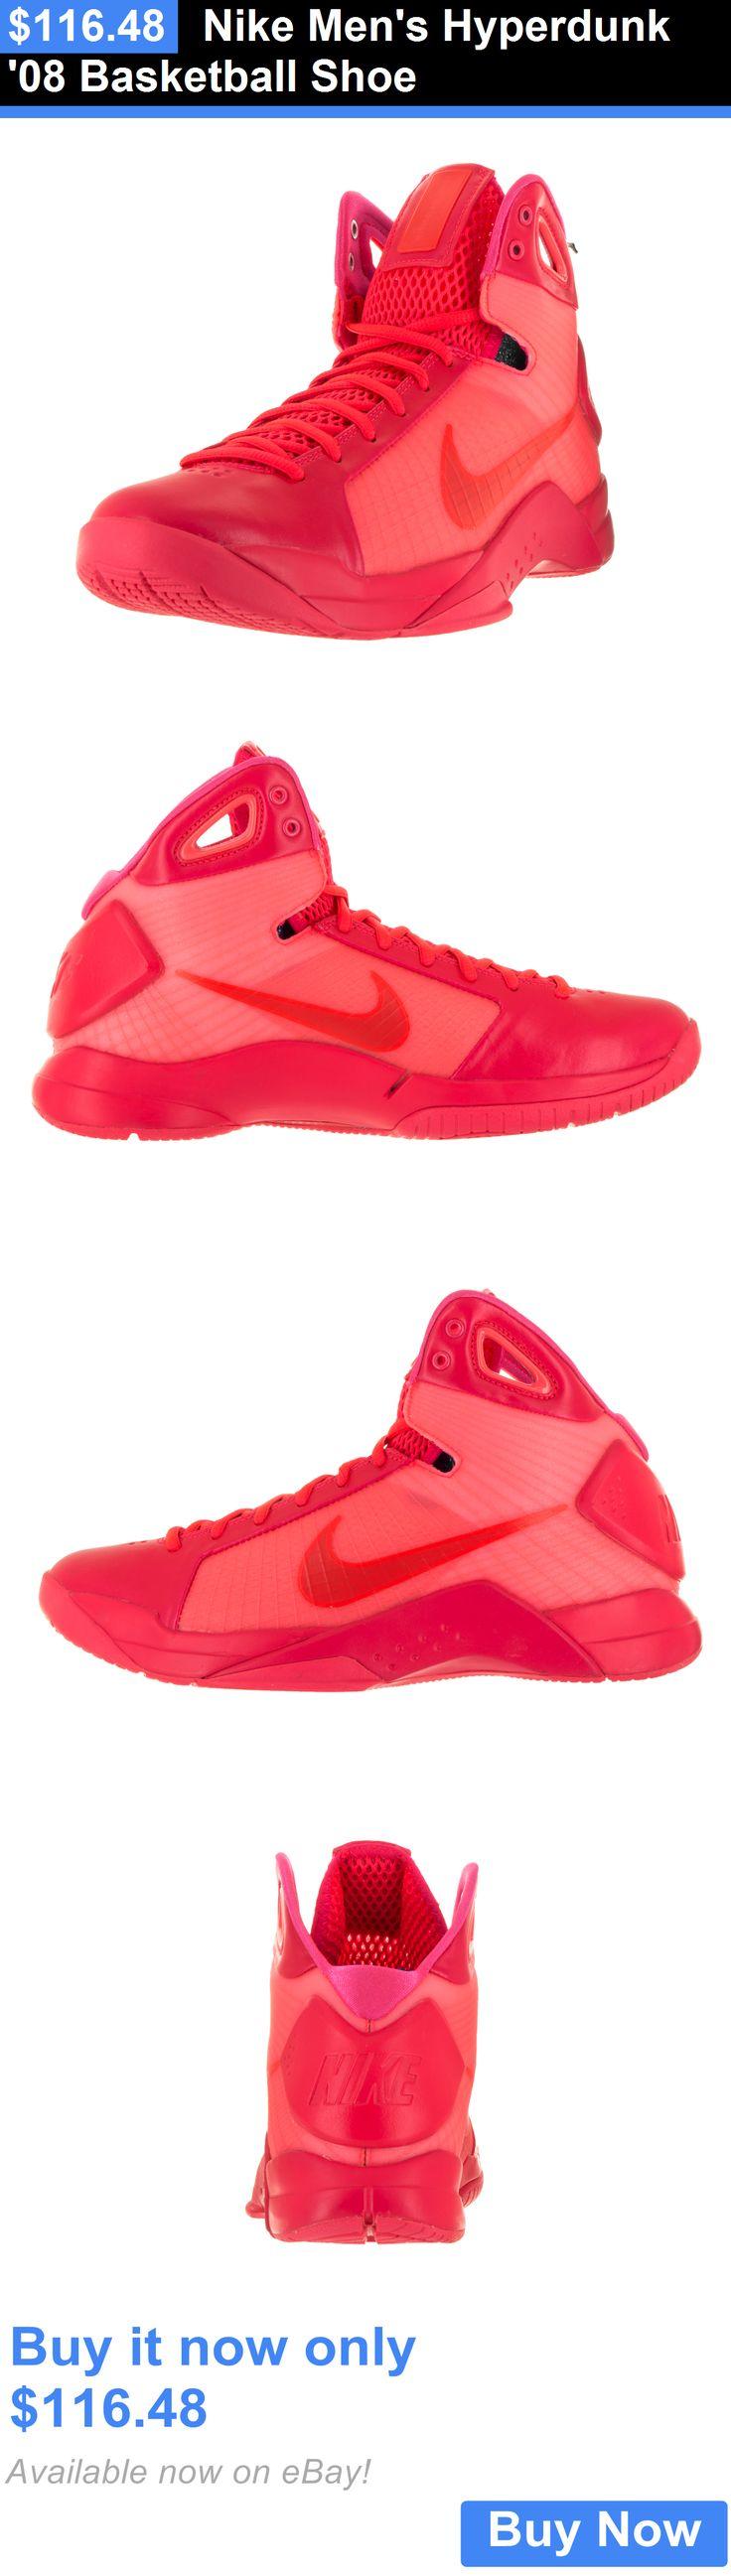 Basketball: Nike Mens Hyperdunk 08 Basketball Shoe BUY IT NOW ONLY: $116.48